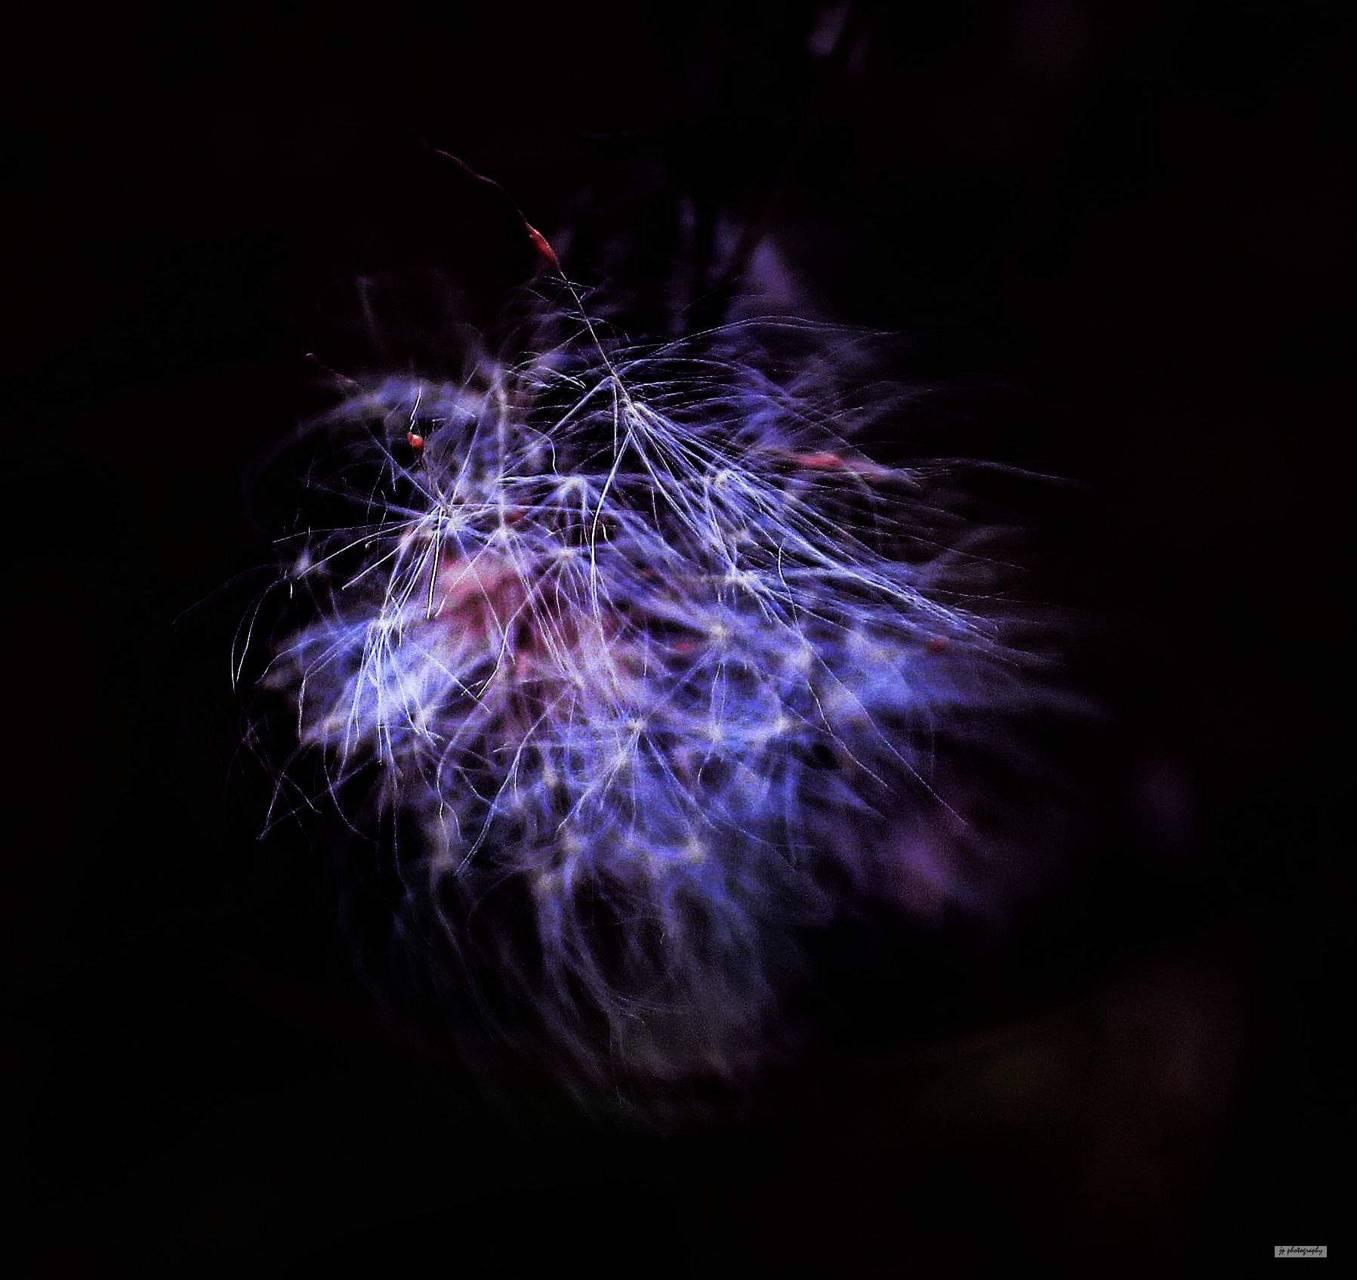 Purple fluff